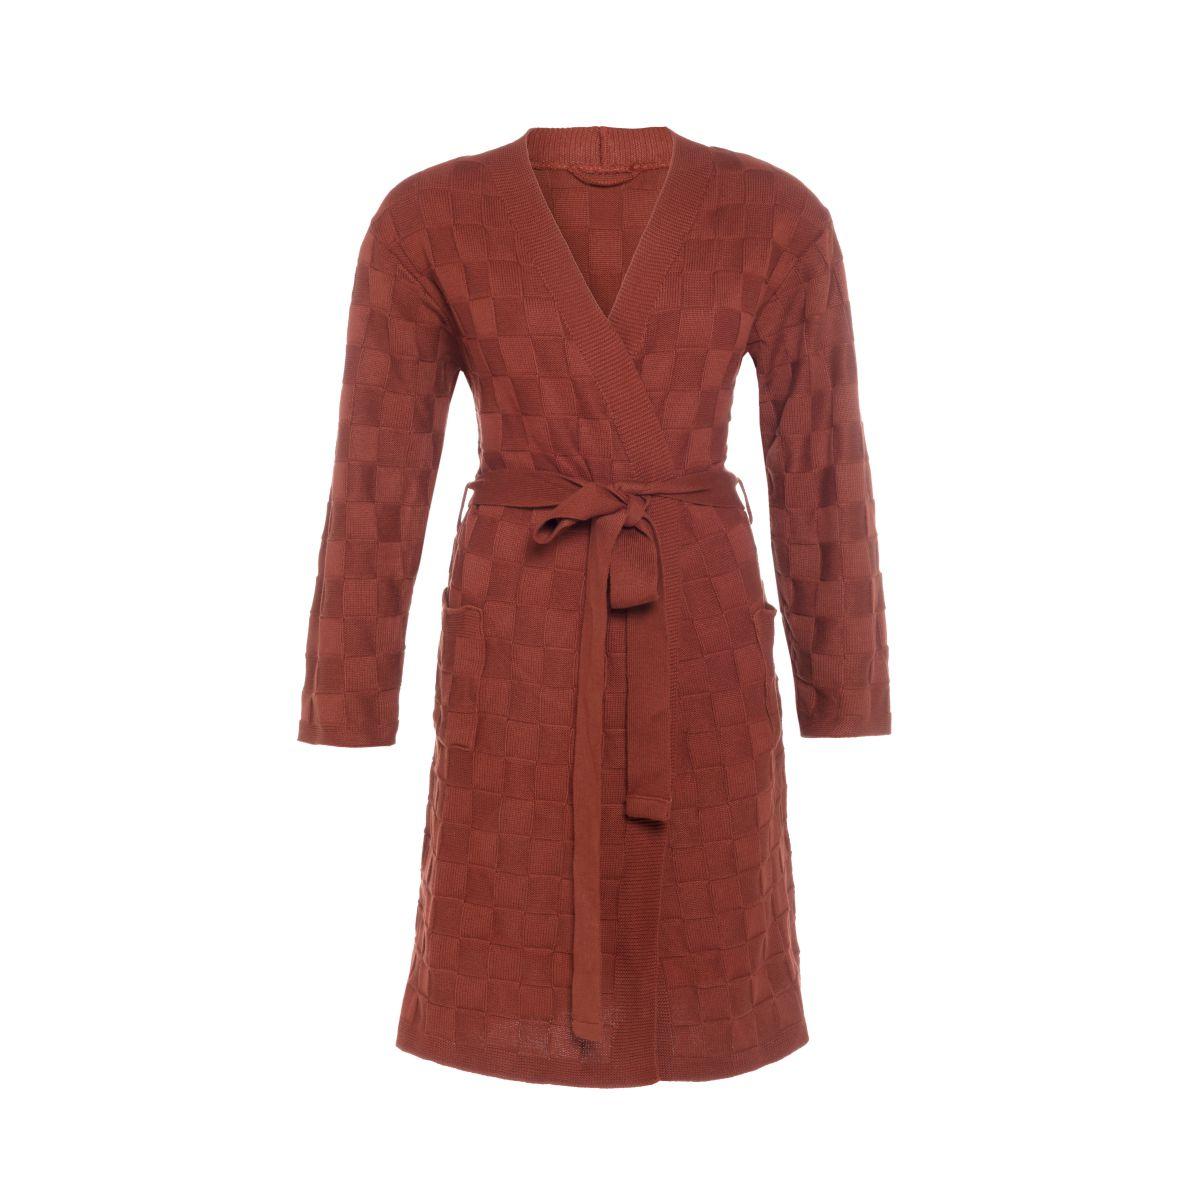 knit factory kf20222003651 badjas ivy roest lxl 1